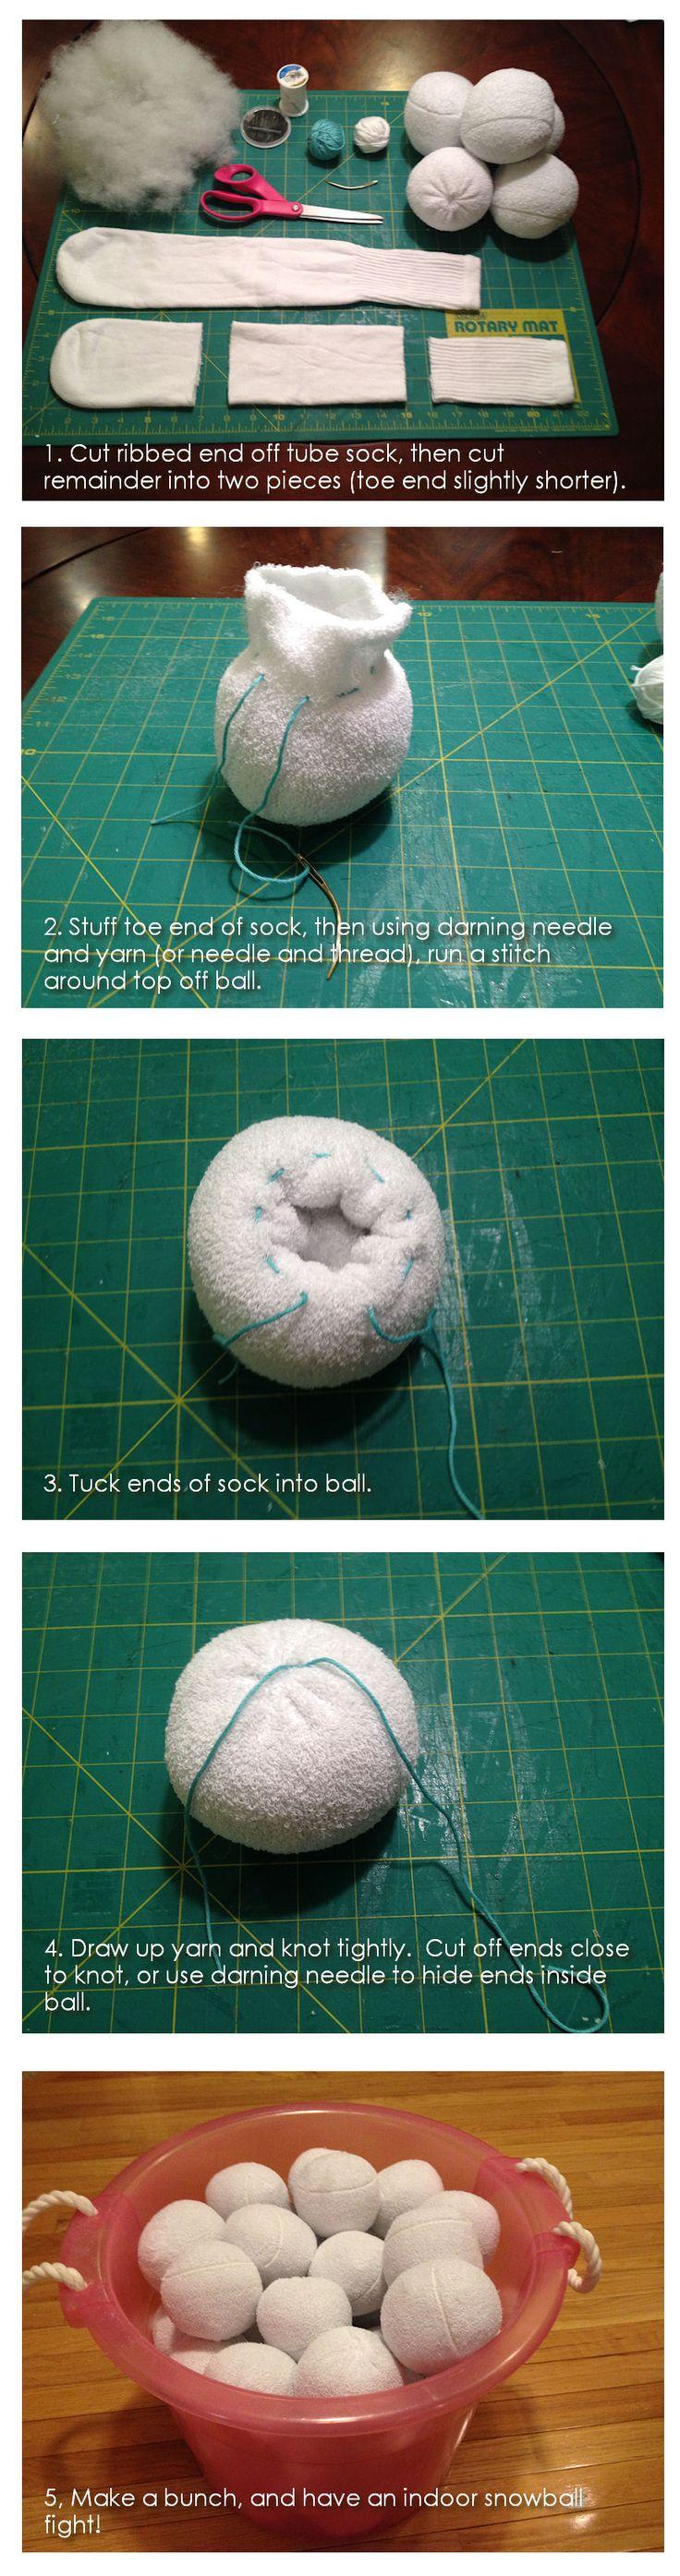 DIY Tubesock Snowballs - Indoor Snowball Fight